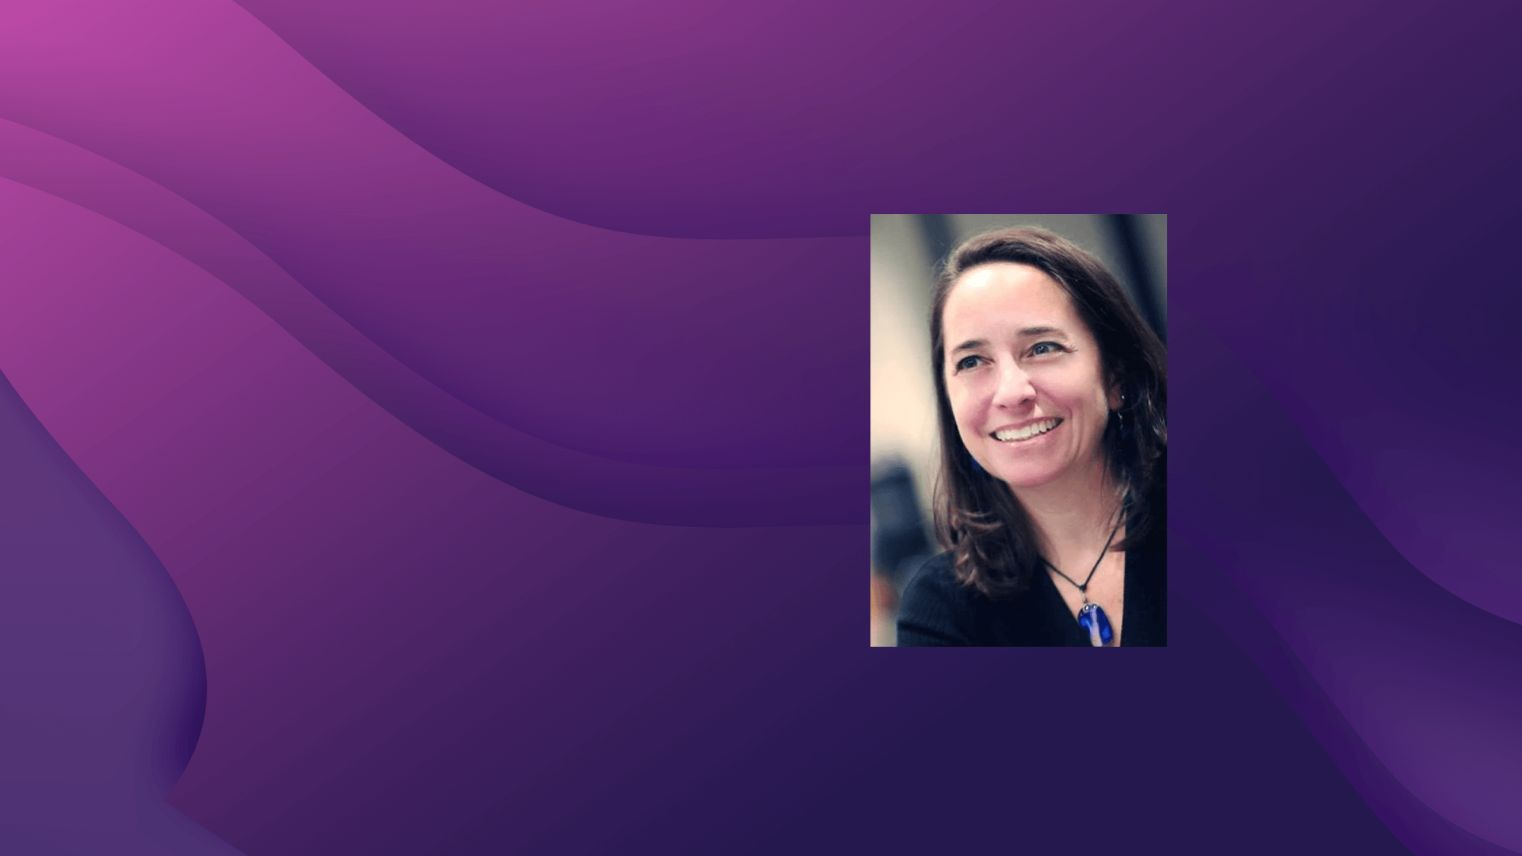 948: Sarah Elkins On Using Technology to Bring Us Closer Together